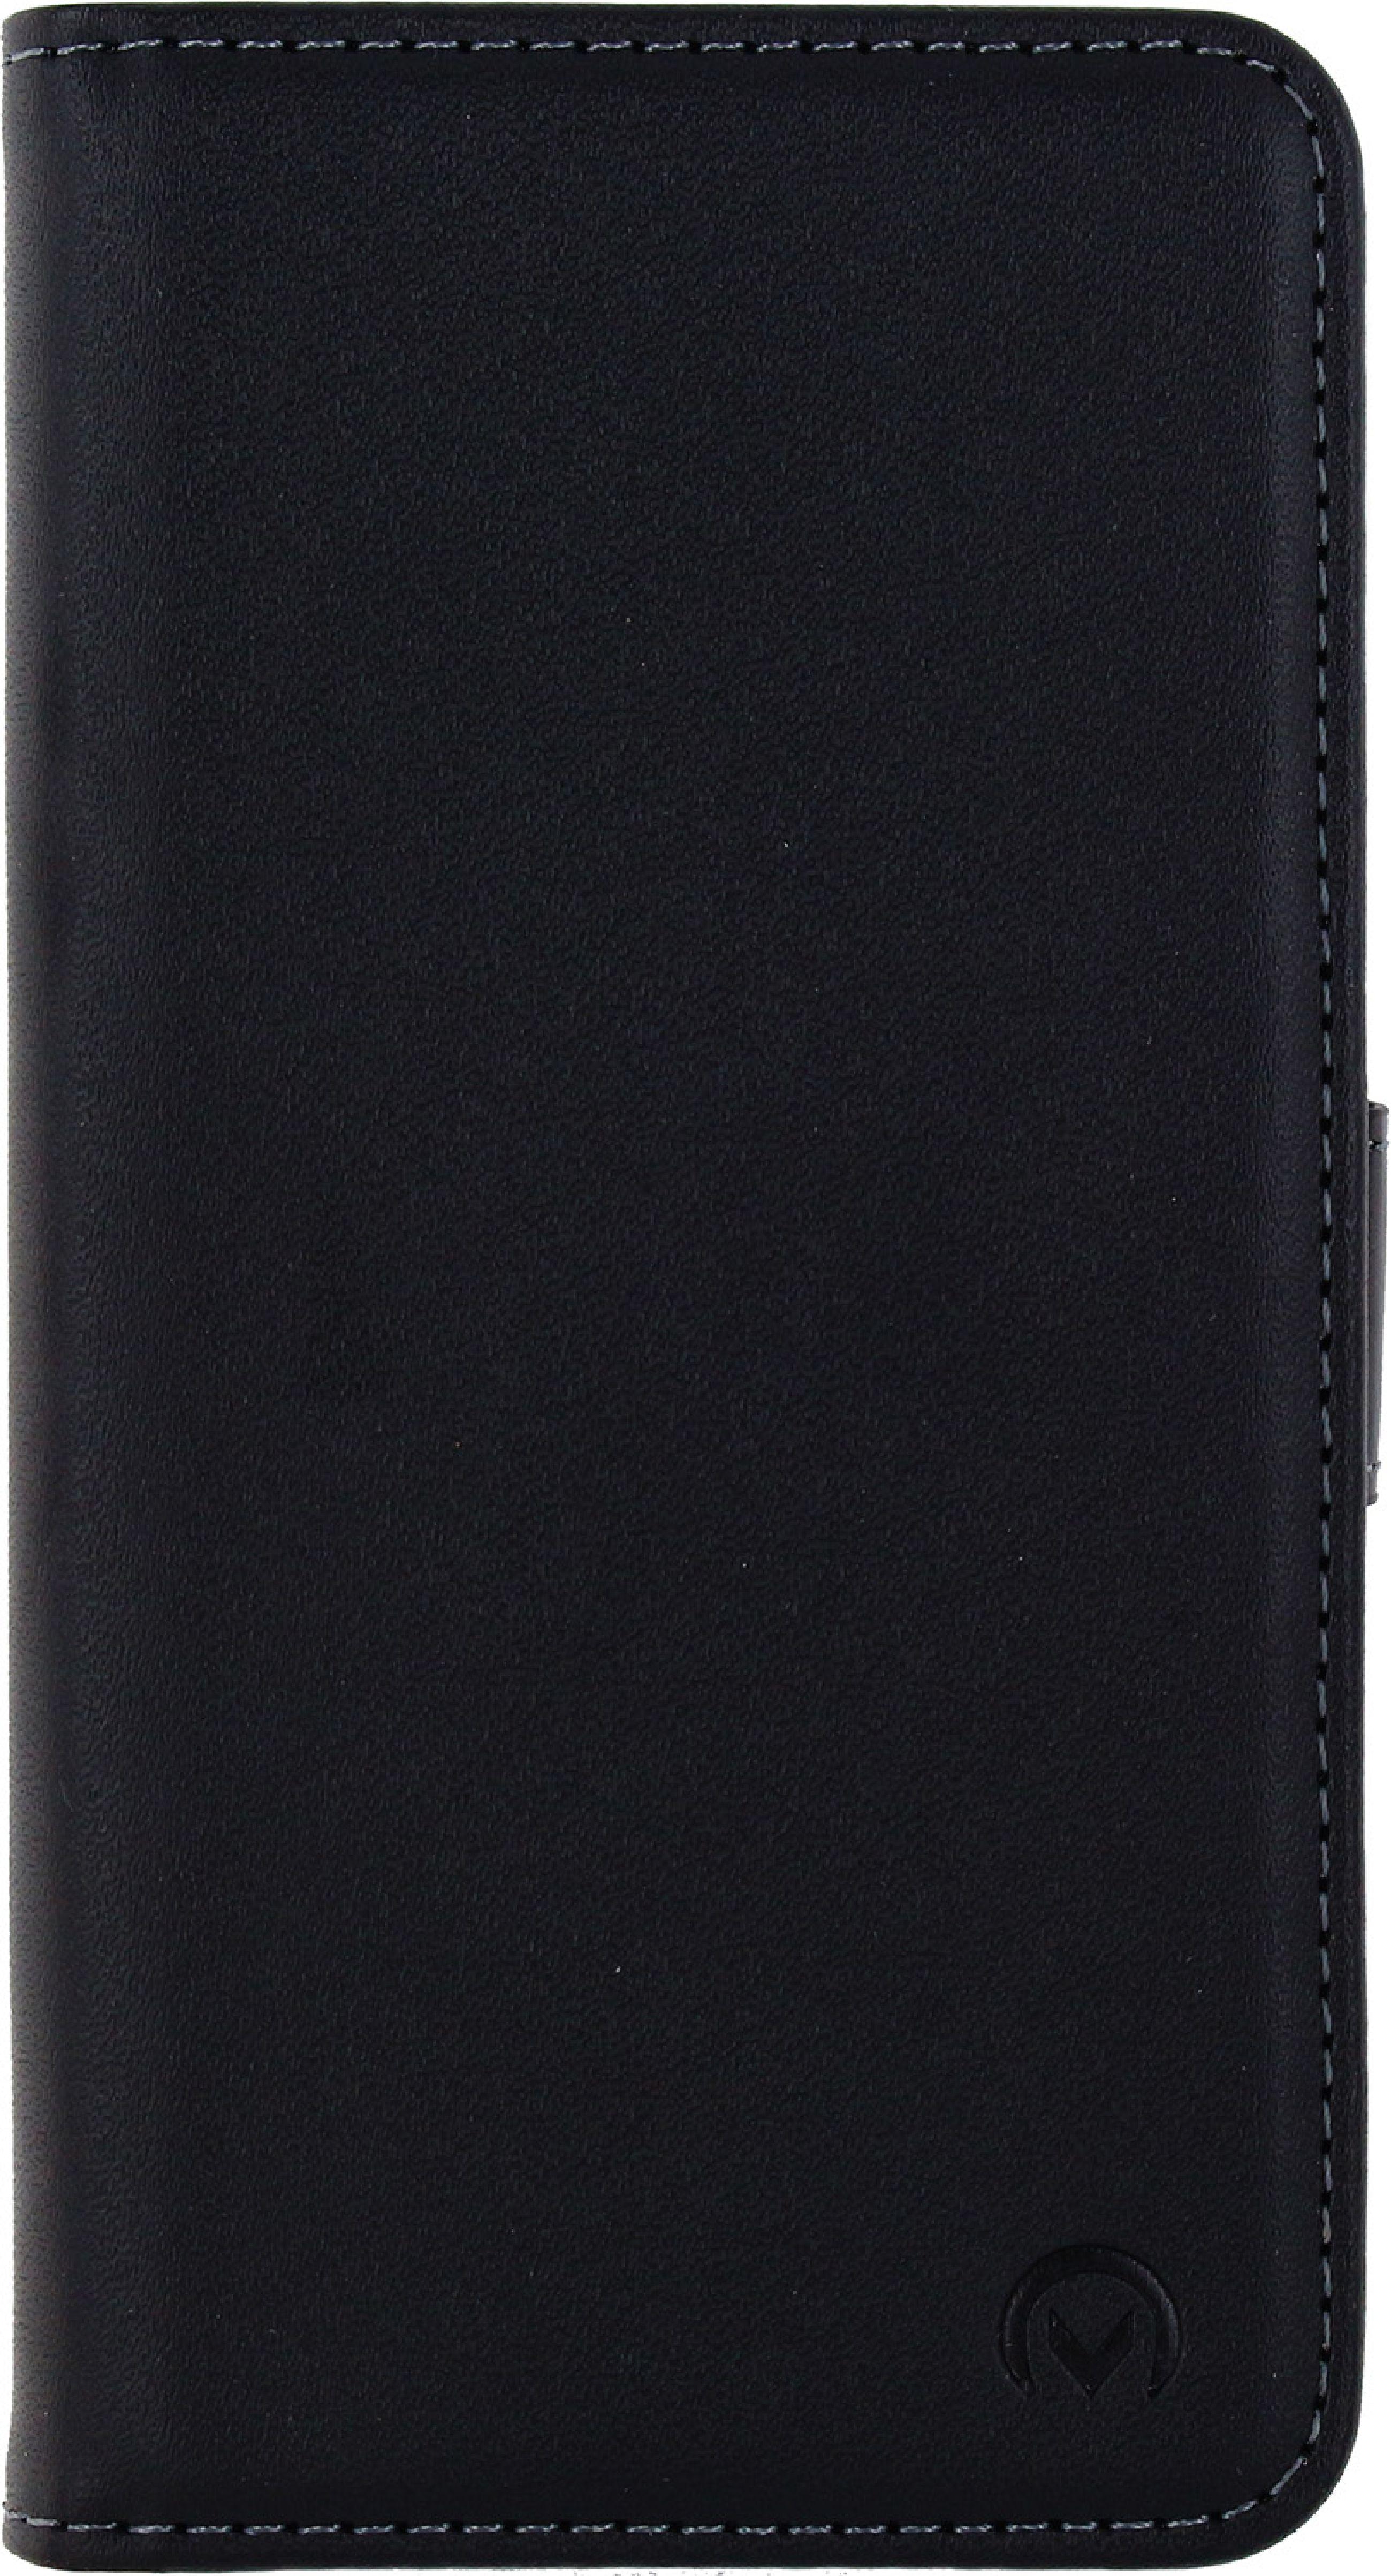 Image of   Telefon Klassisk Lommebogsetui Huawei P8 Lite 2017 / Huawei P9 Lite 2017 Sort